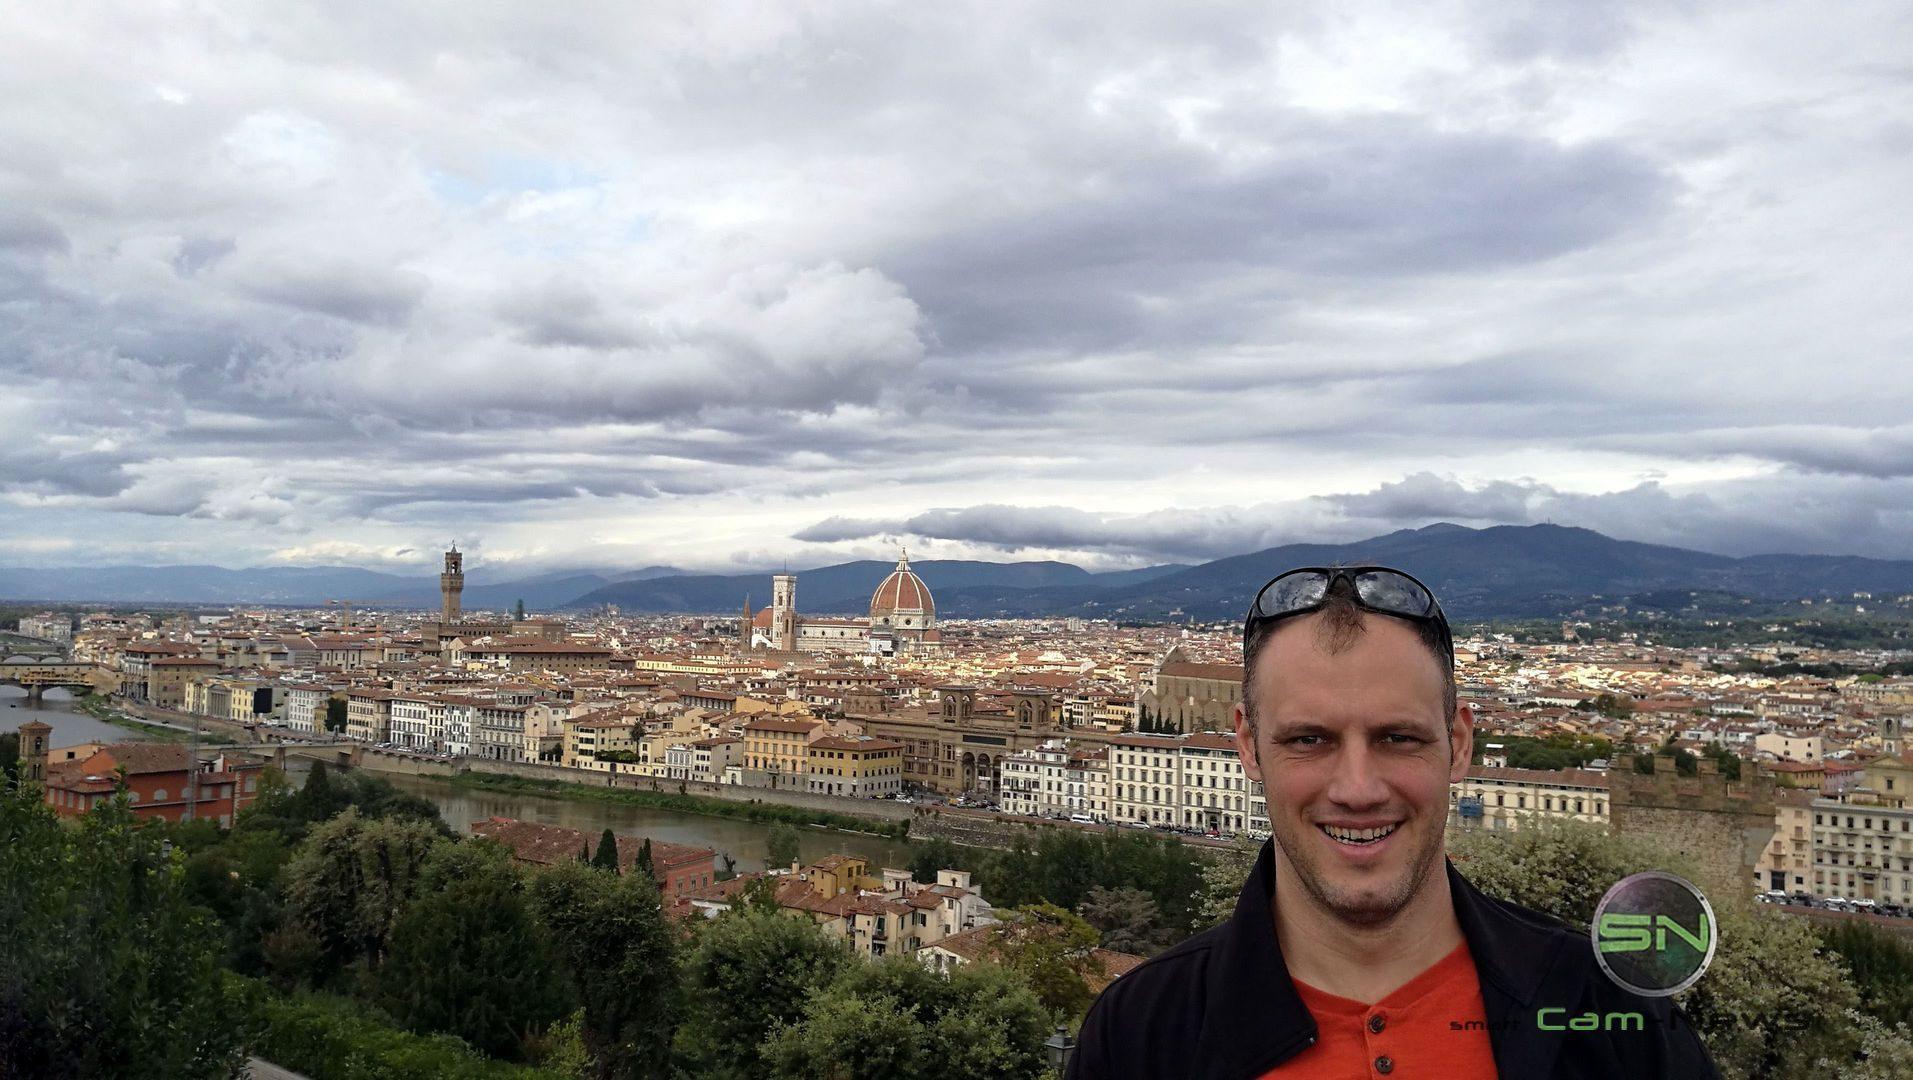 florenz-selfie-nikon-b500-megazoom-bridge-smartcamnews